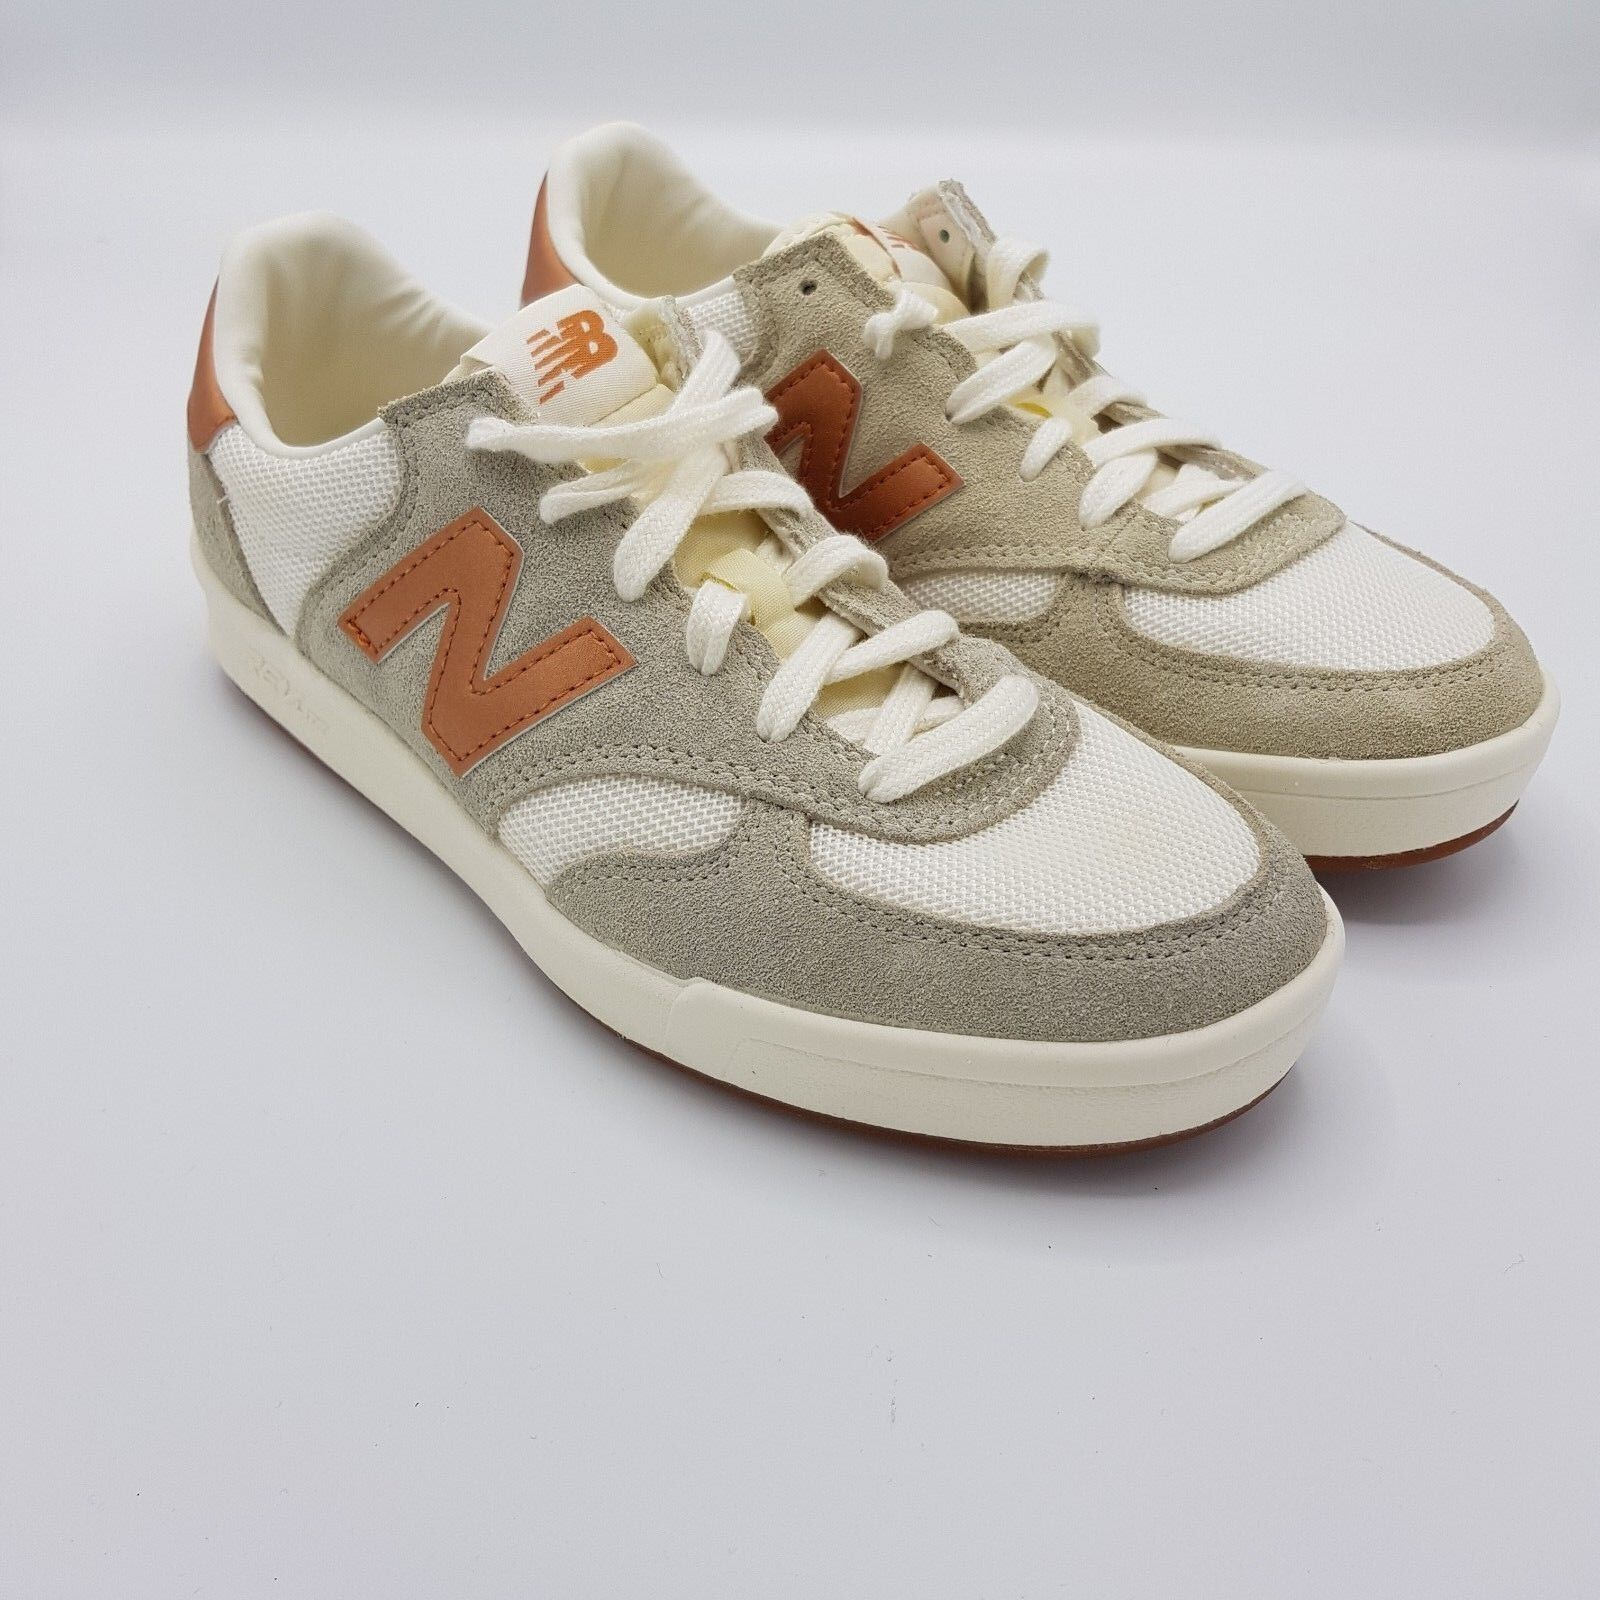 New Balance WRT300MA Damen Schuhe Sneakers Beige / / Beige Weiß 84be67